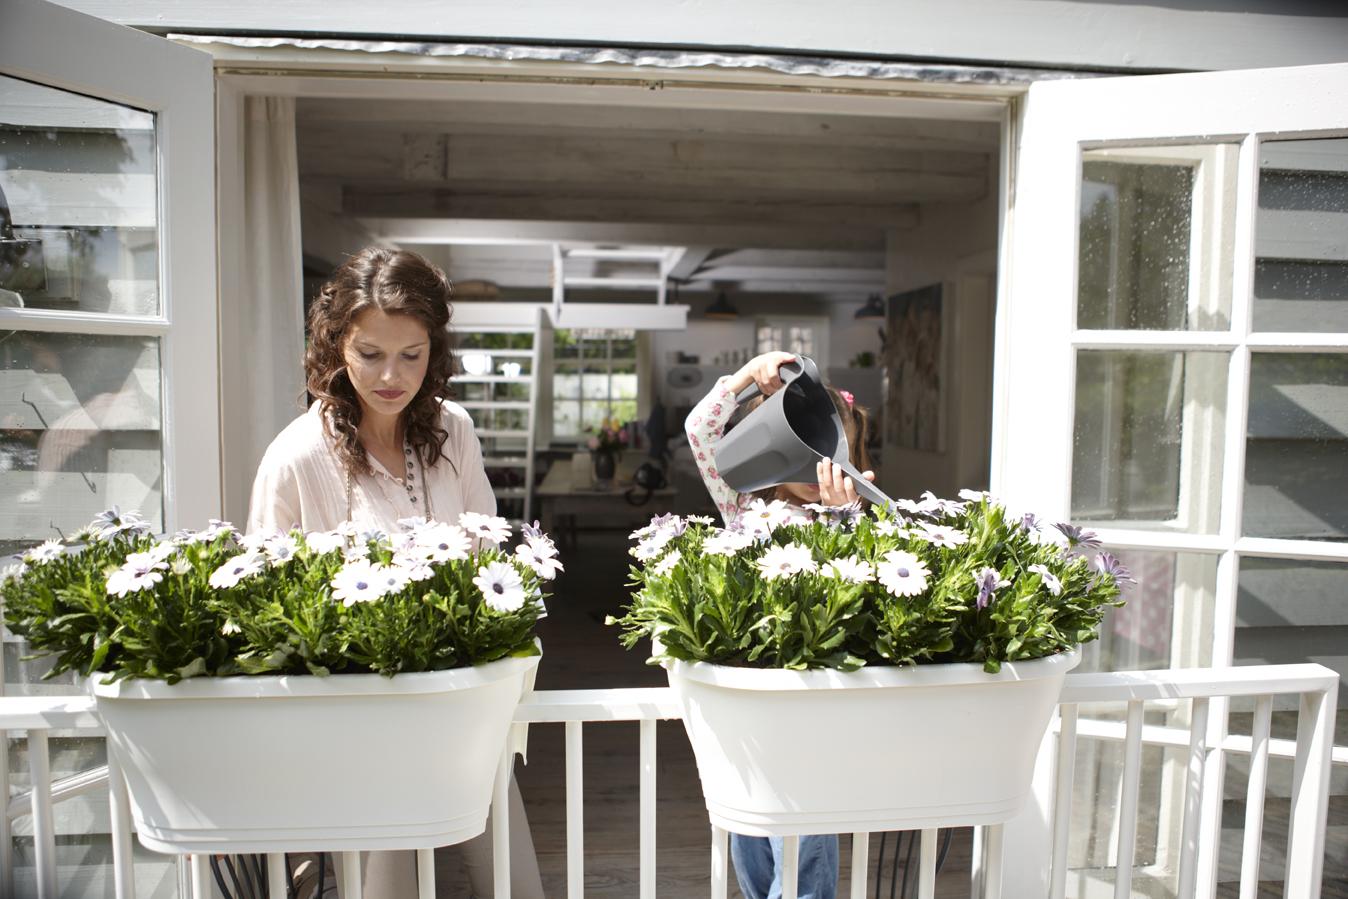 Truhlíky na balkony a terasy